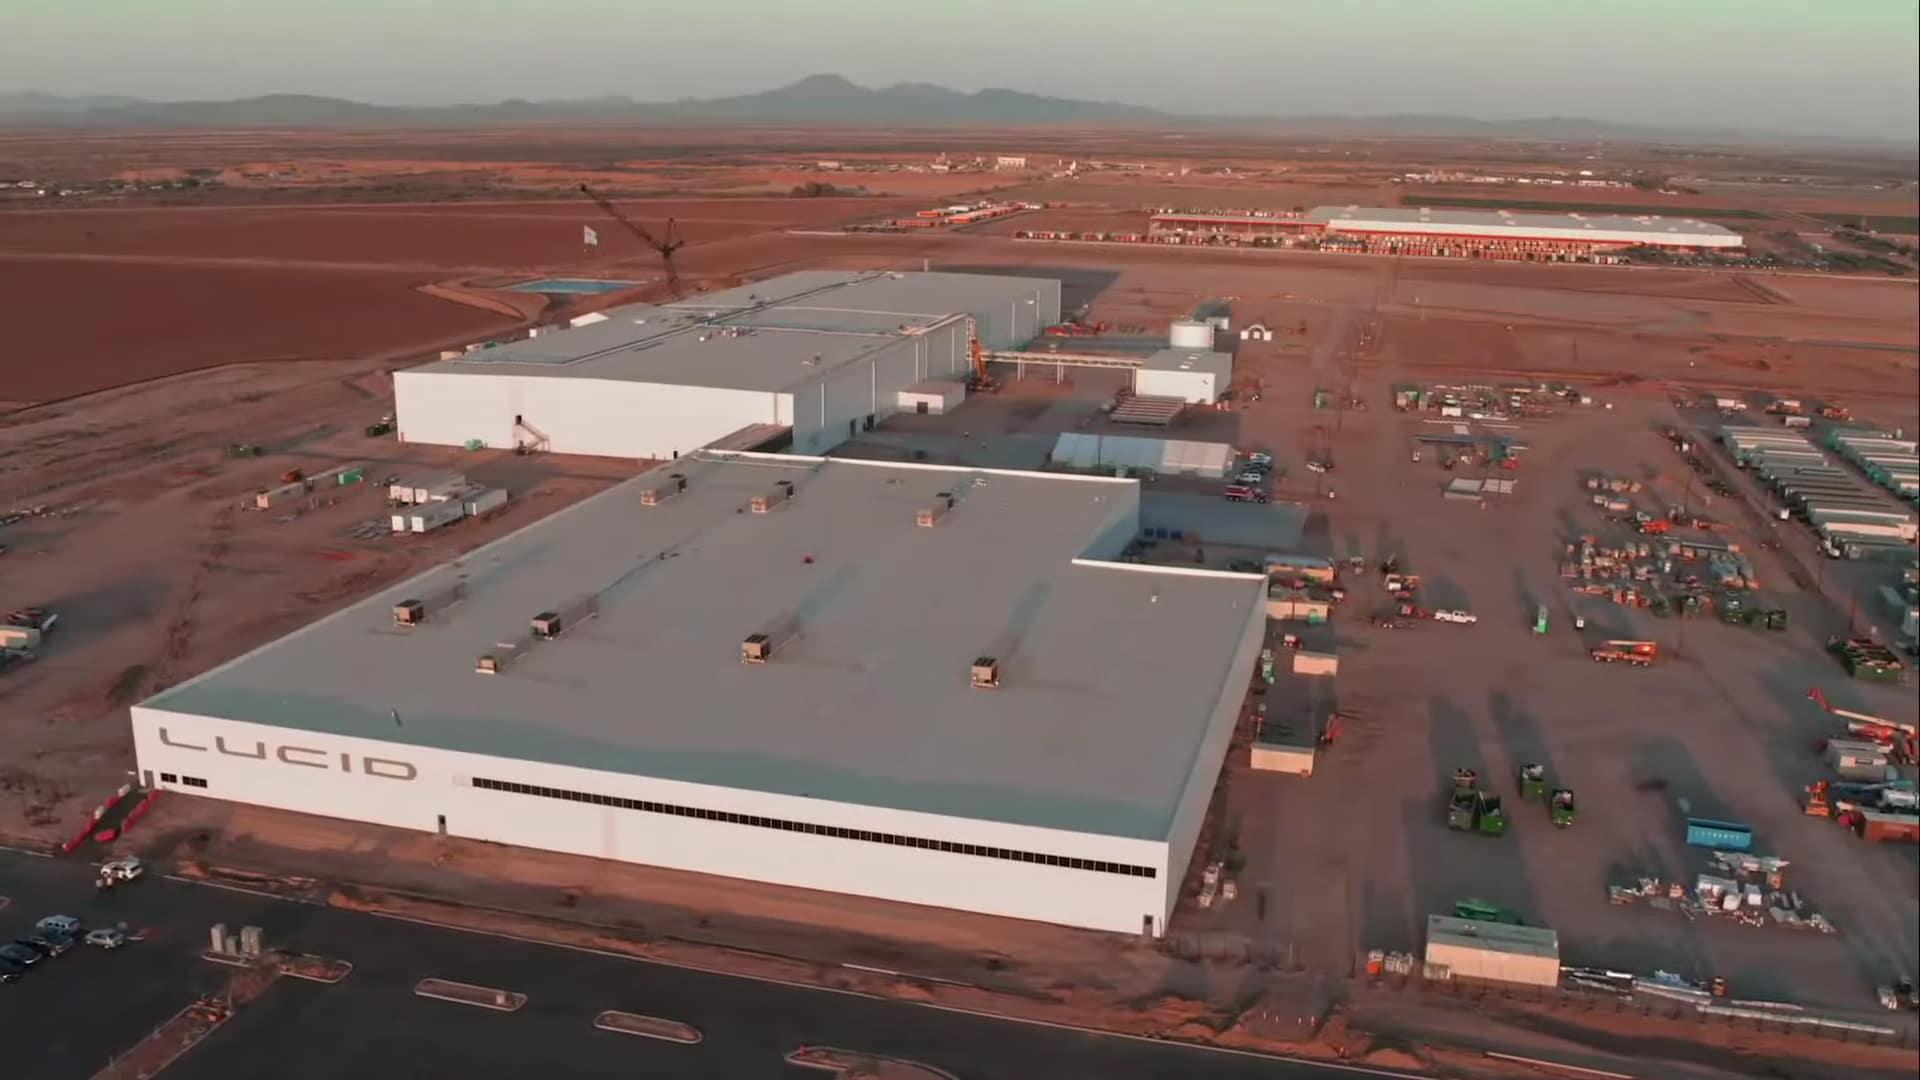 Lucid Motors Casa Grande Factory